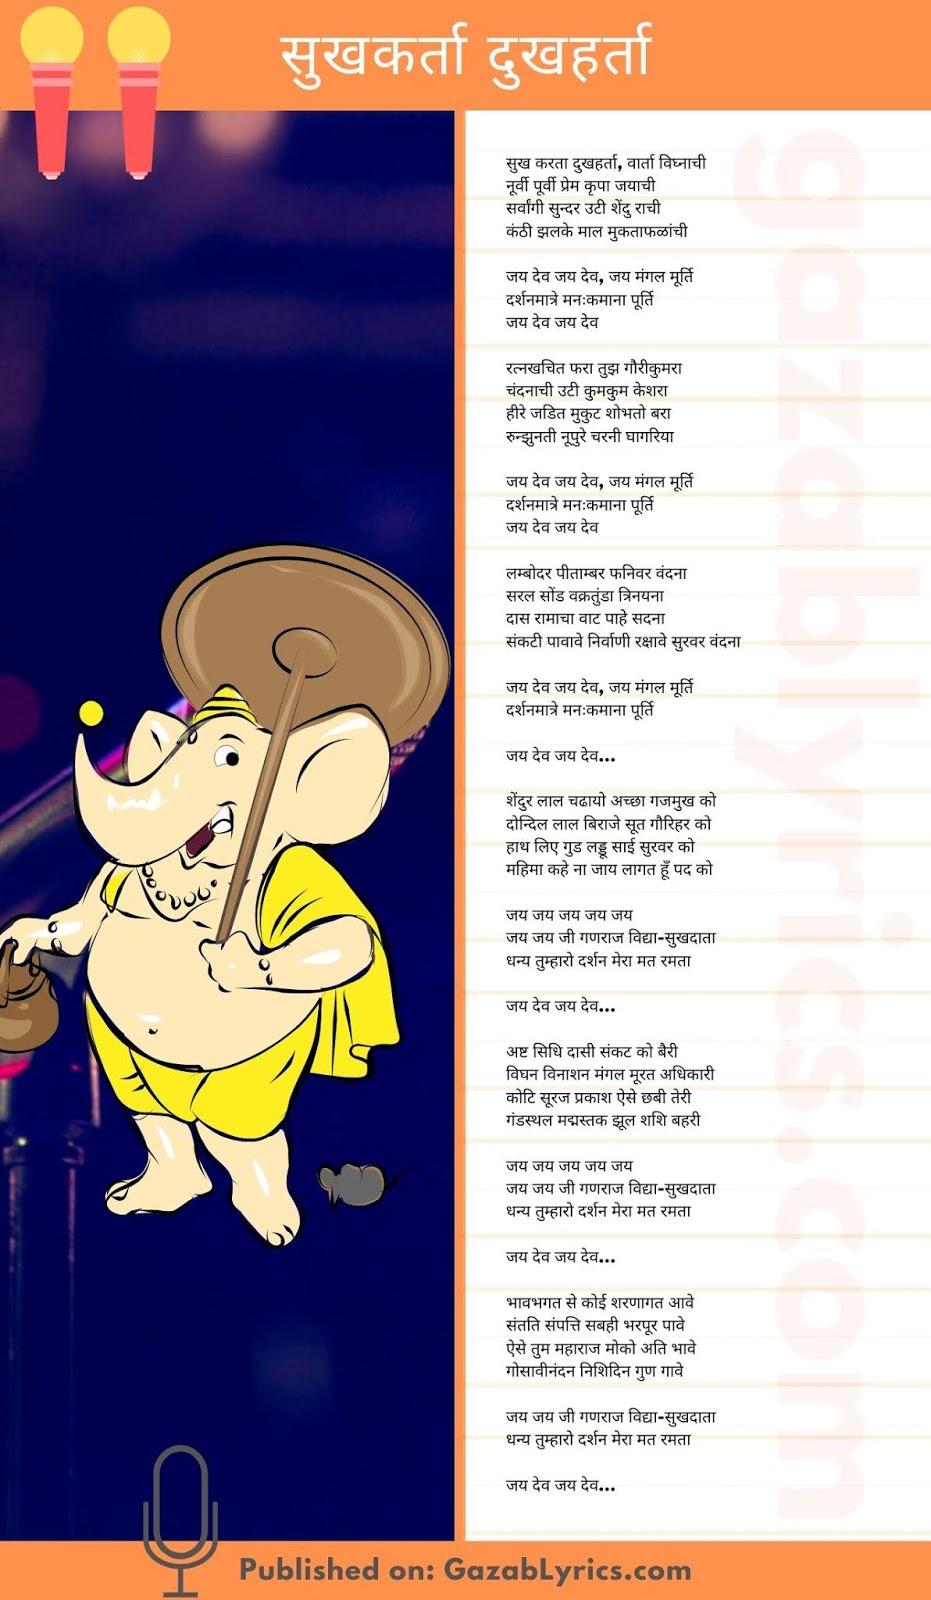 Jai Dev Jai Dev Jai Mangal Murti aarti song lyrics image